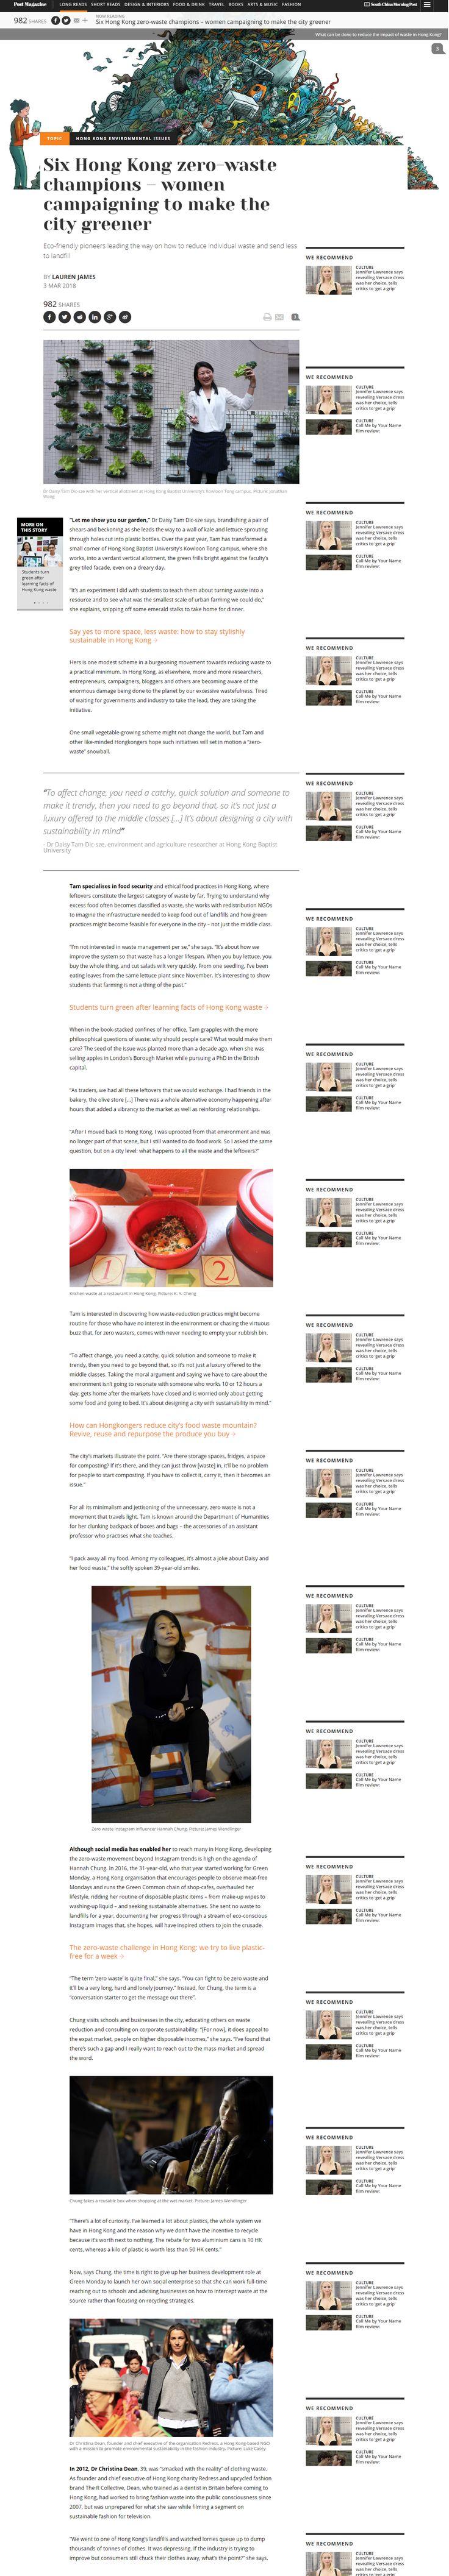 """Six Hong Kong zero-waste champions – women campaigning to make the city greener"" - SCMP Post Magazine, March 2018 #sustainablefashion #ECDA  #EcoChicDesignAwards #getredressed #RedressDesignAward #RDA #christinadean #drchristinadean"